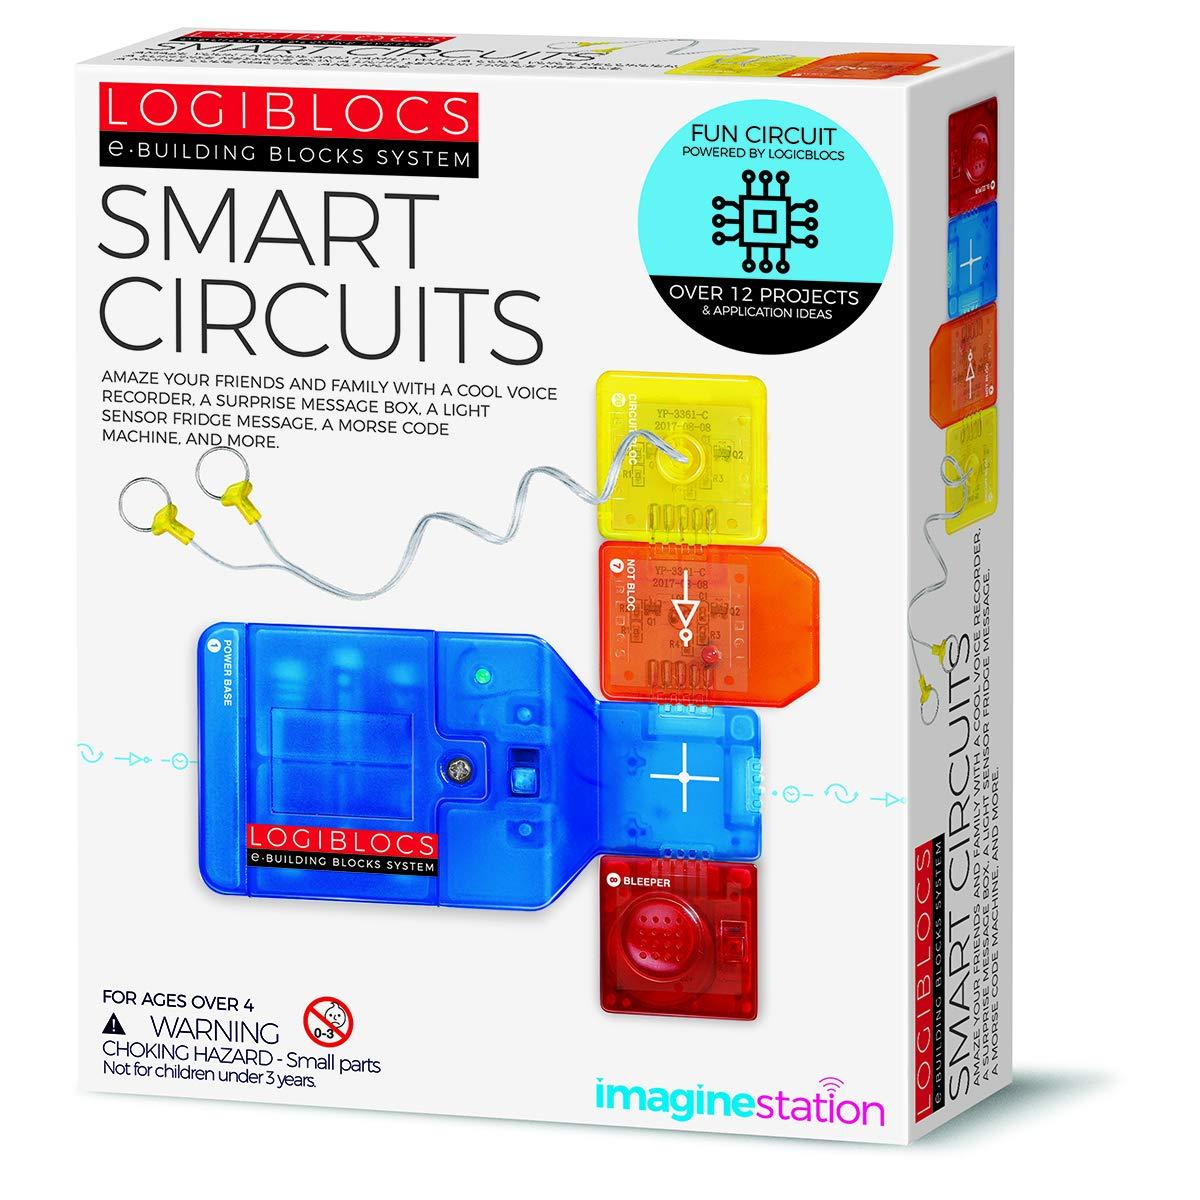 4m 406806 Logiblocs Smart Circuit White Toys Games Voice Recorder